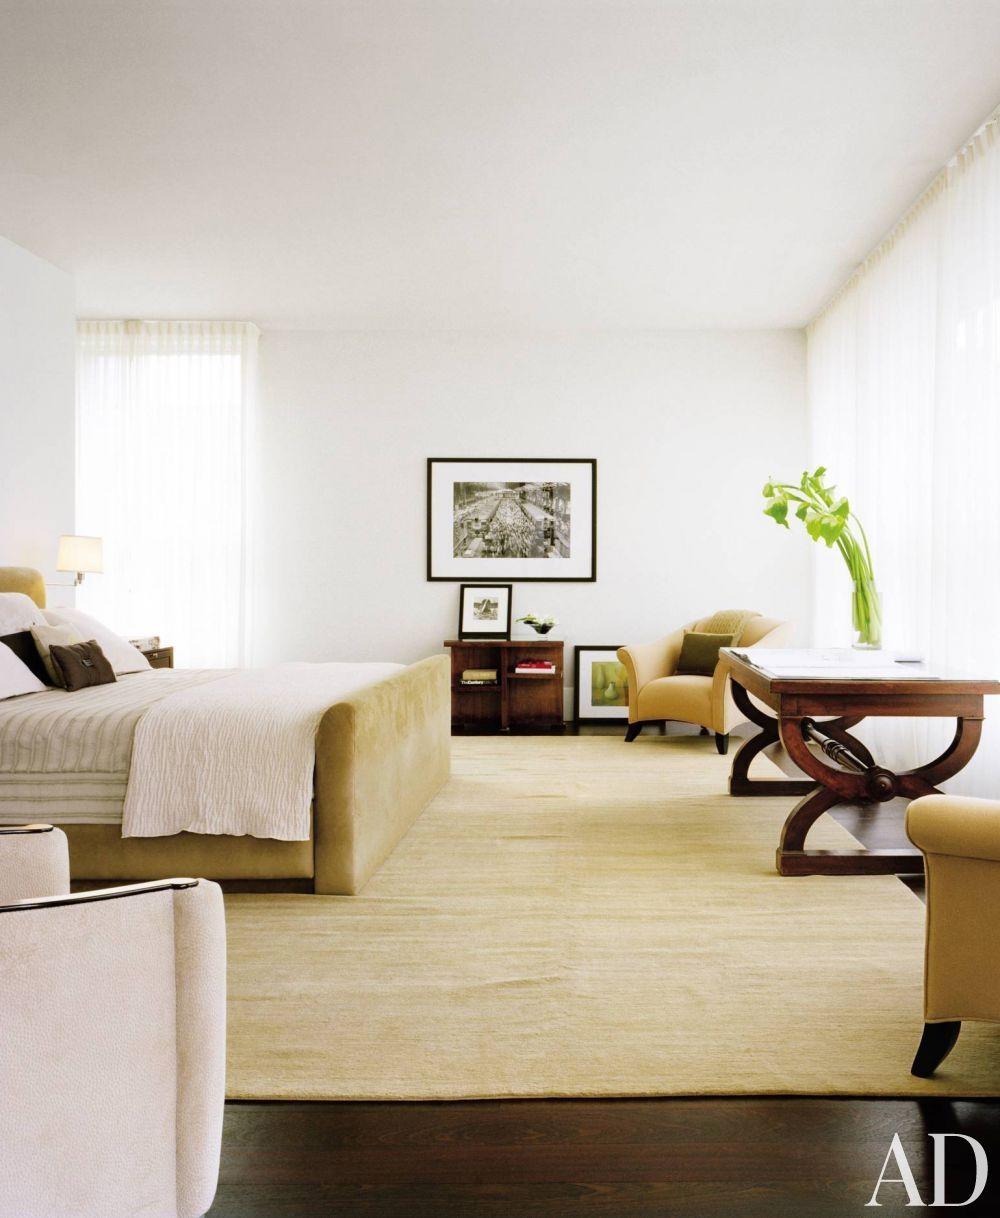 Modern bedroom by jennifer post in new york city